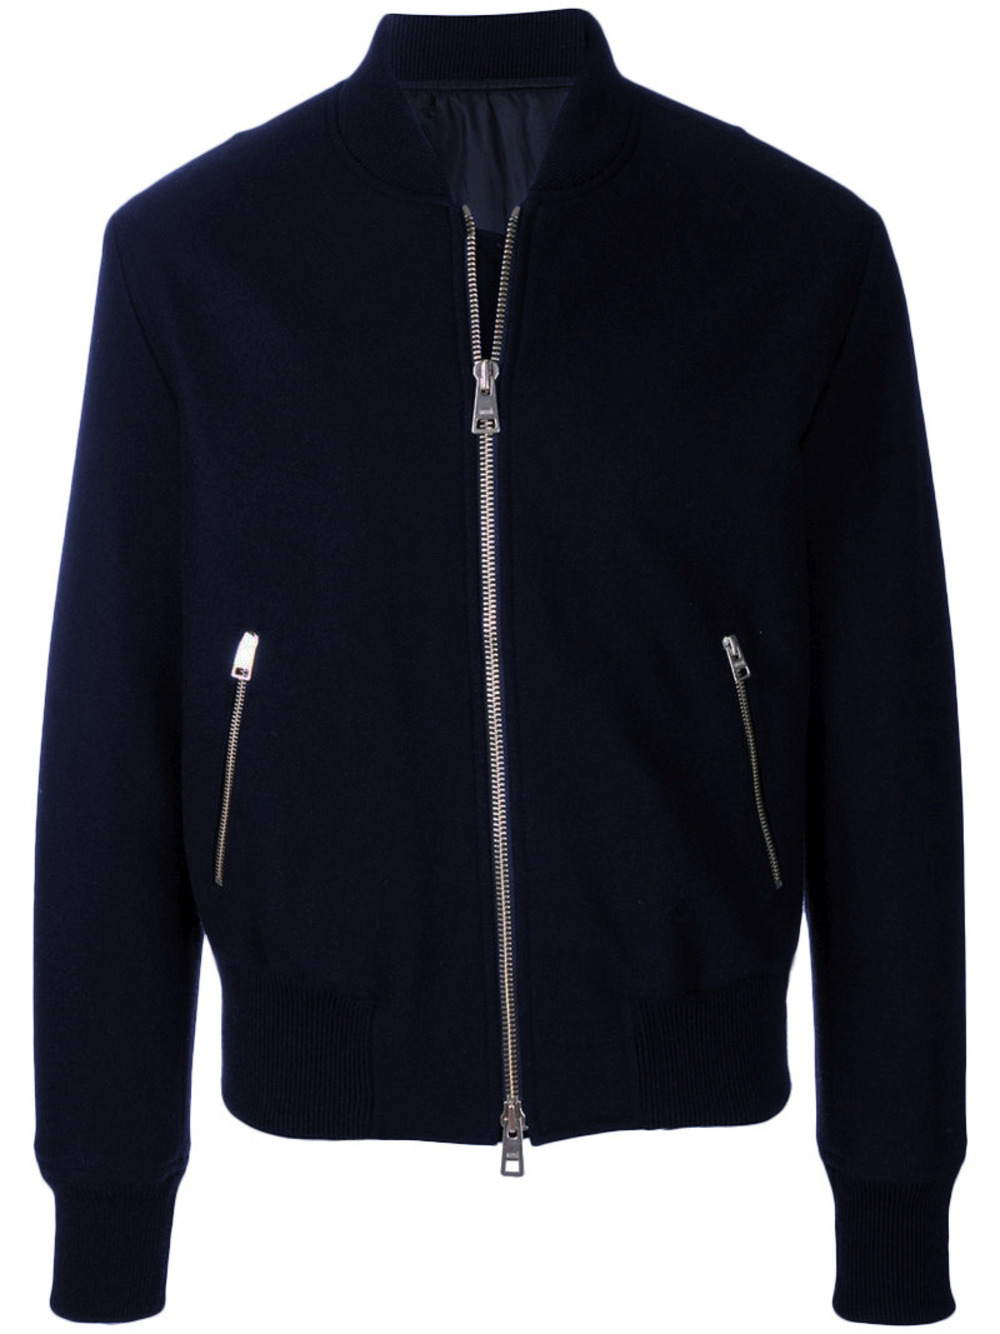 Мужское зимнее пальто арт.502